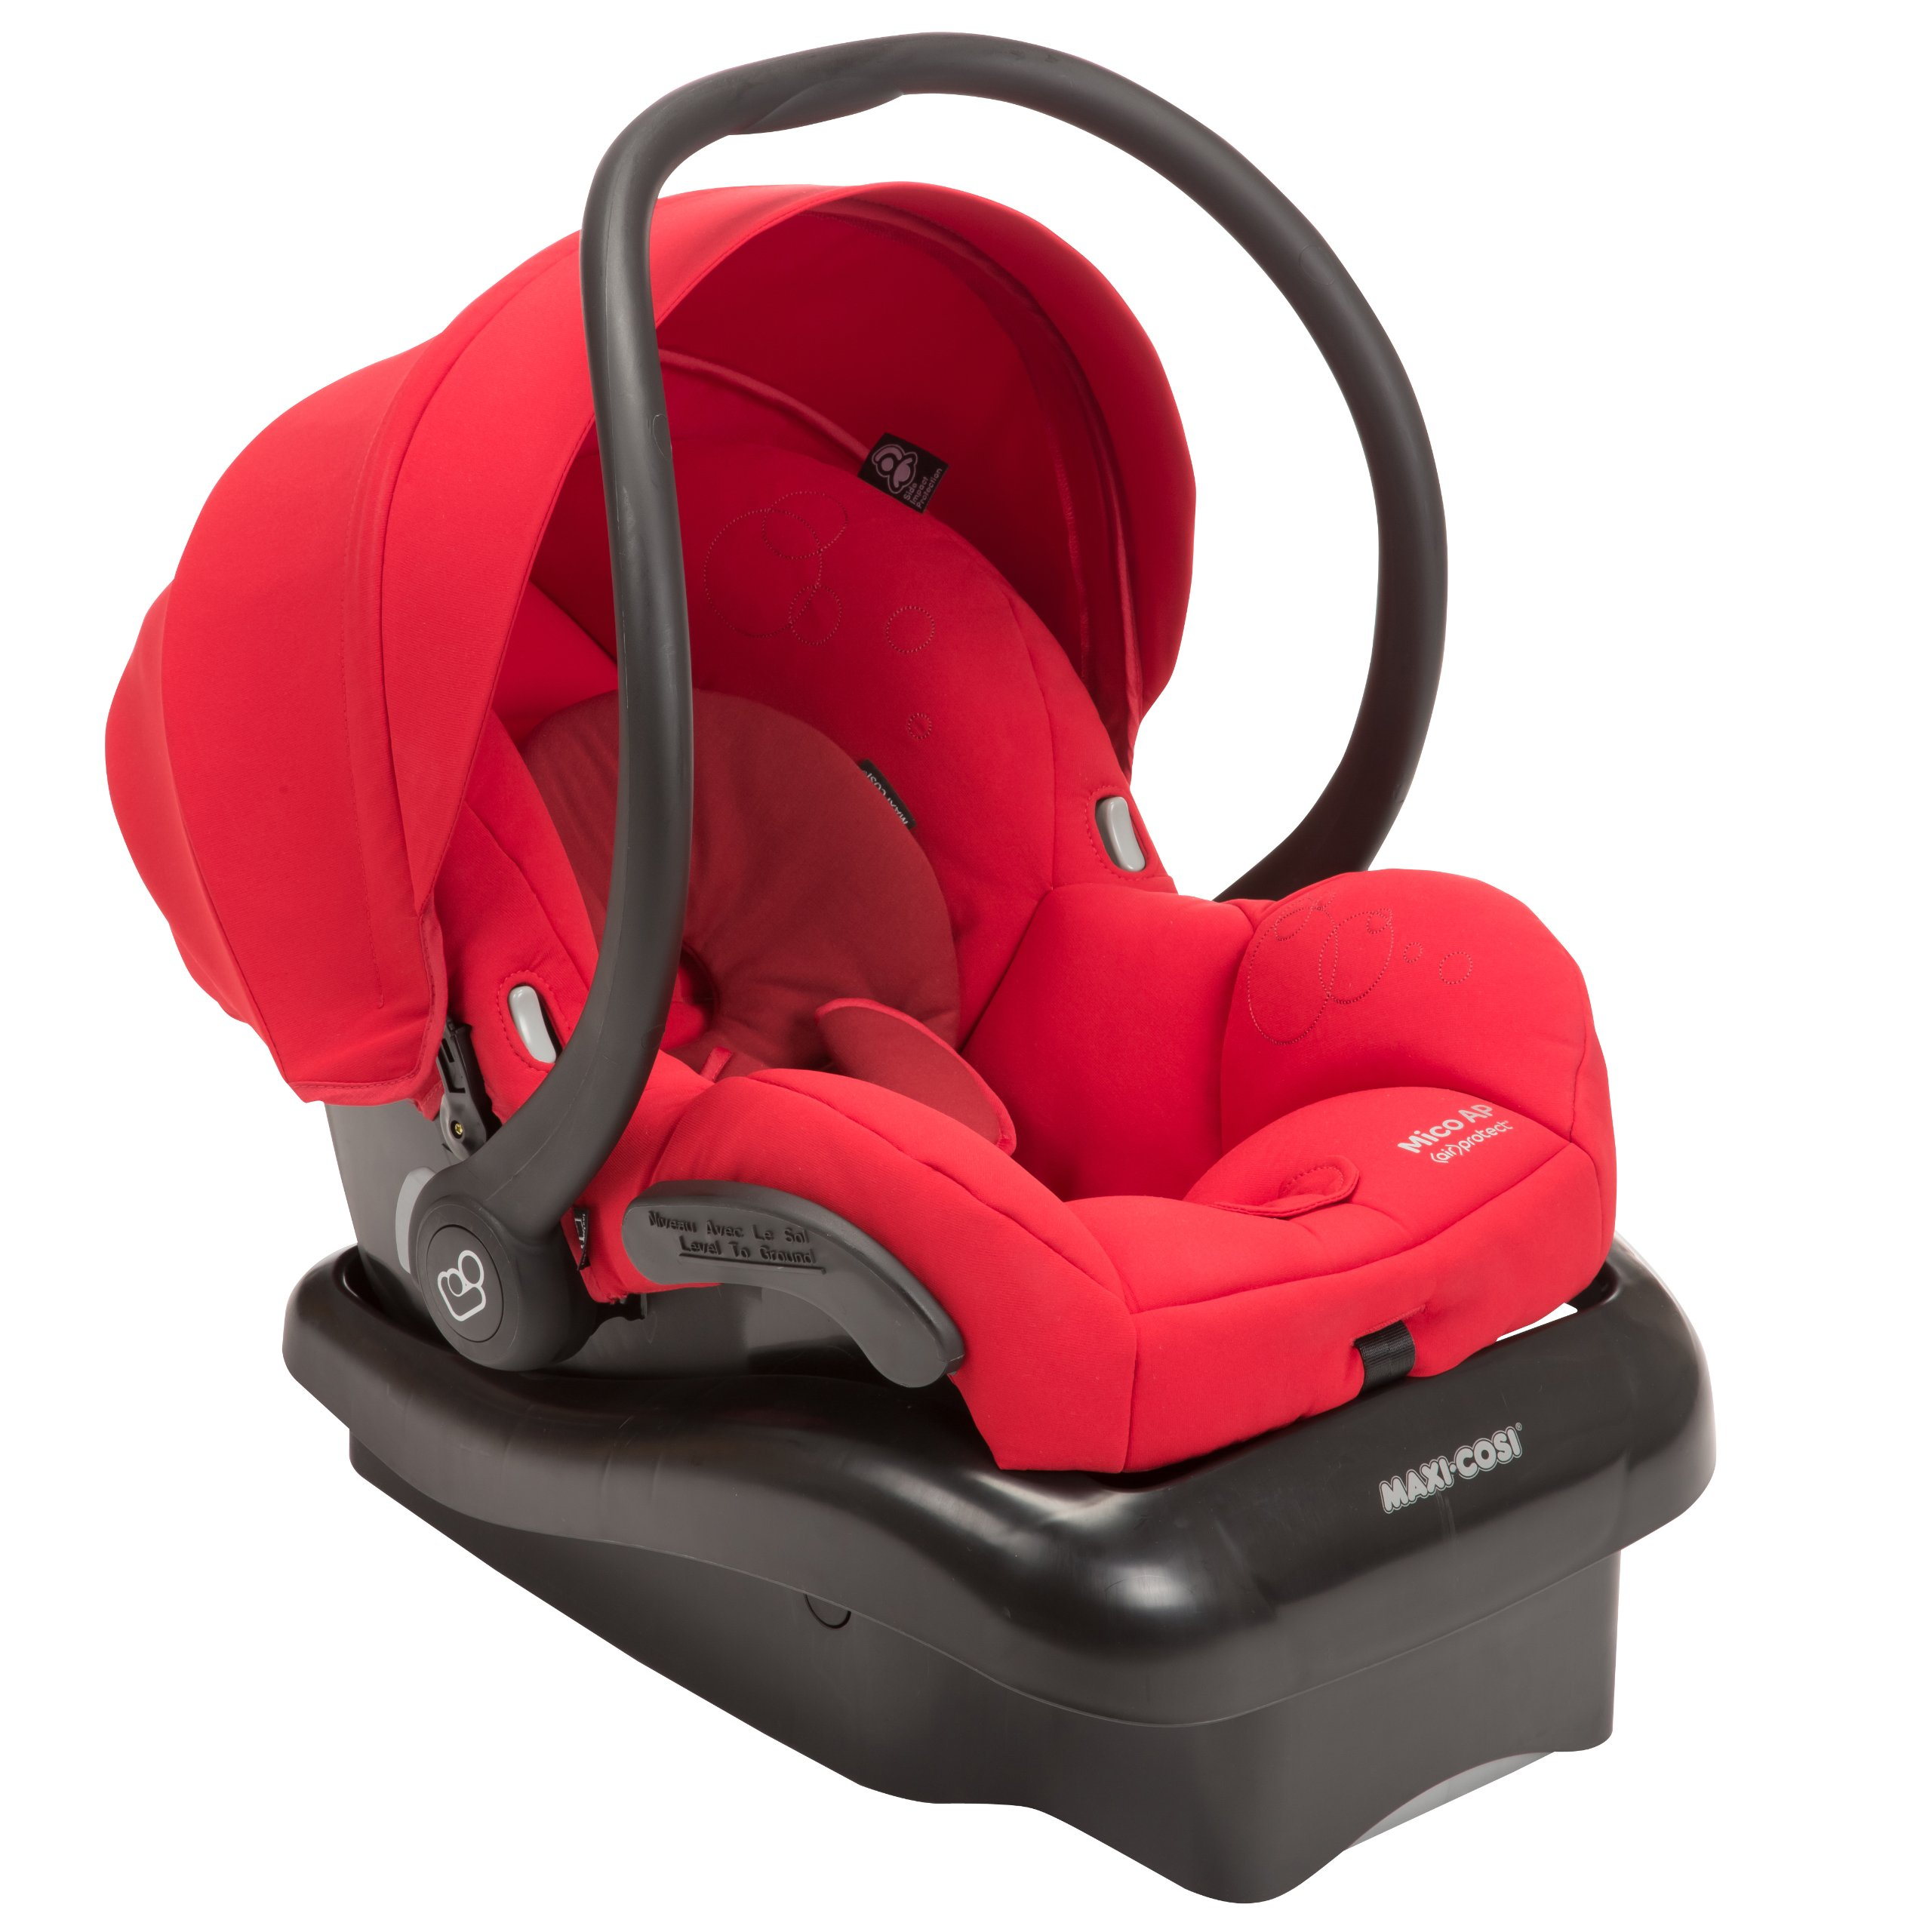 Maxi-Cosi Mico AP Infant Car Seat - Red by Maxi-Cosi (Image #1)